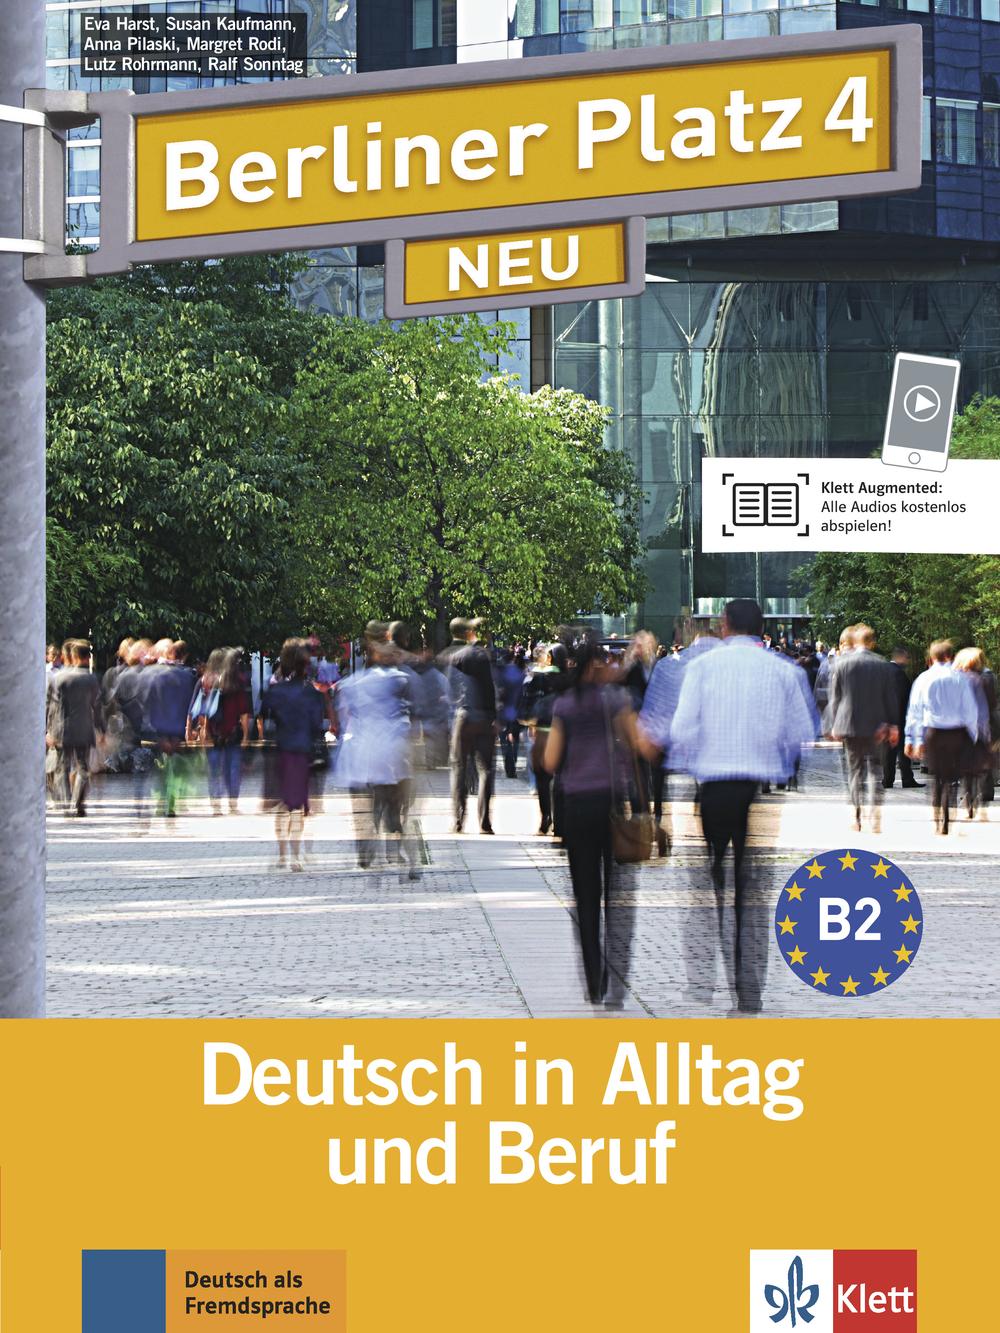 Berliner Platz 4 NEU